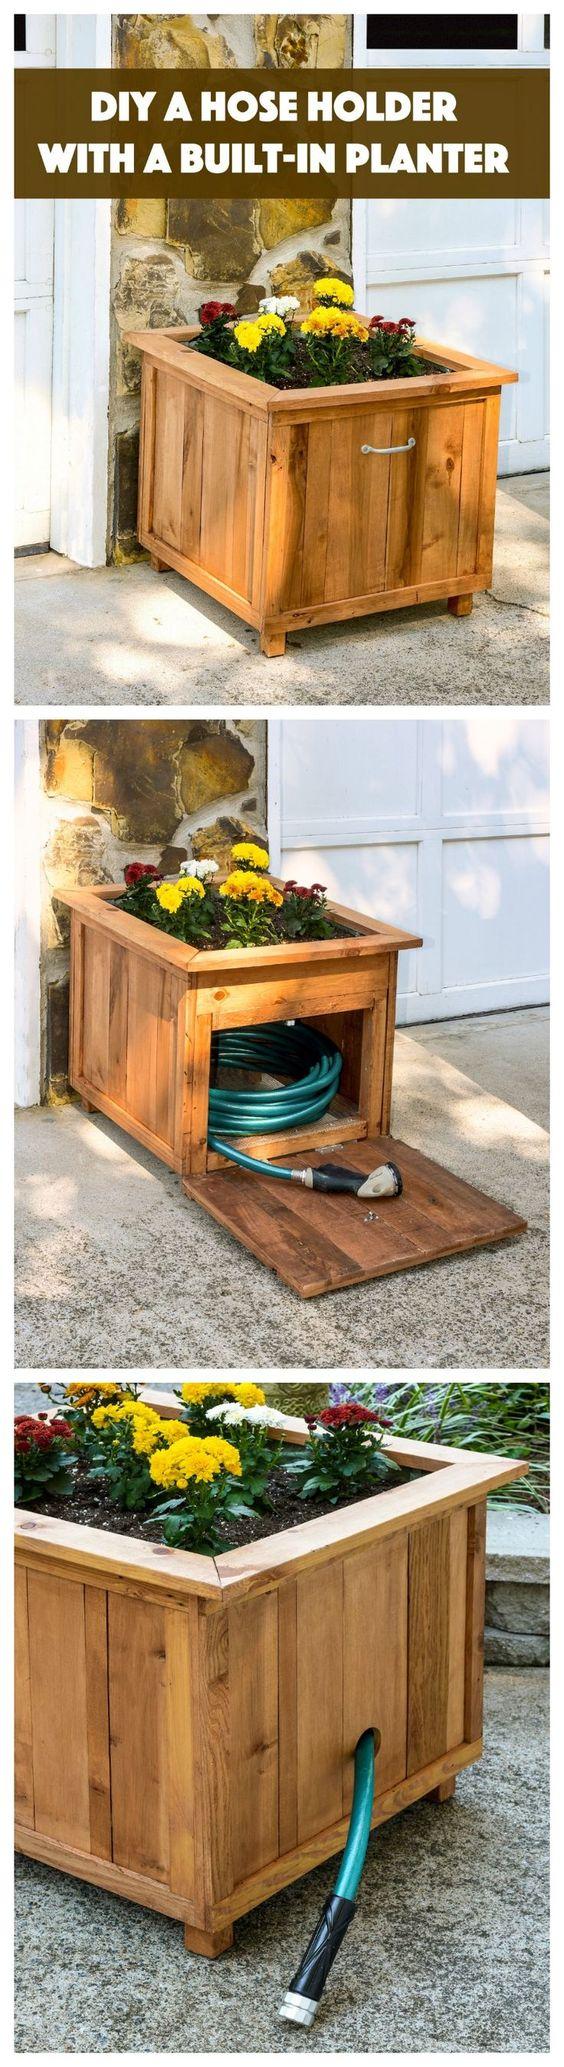 DIY Pallet Wood Hose Holder With A Planter Built In.